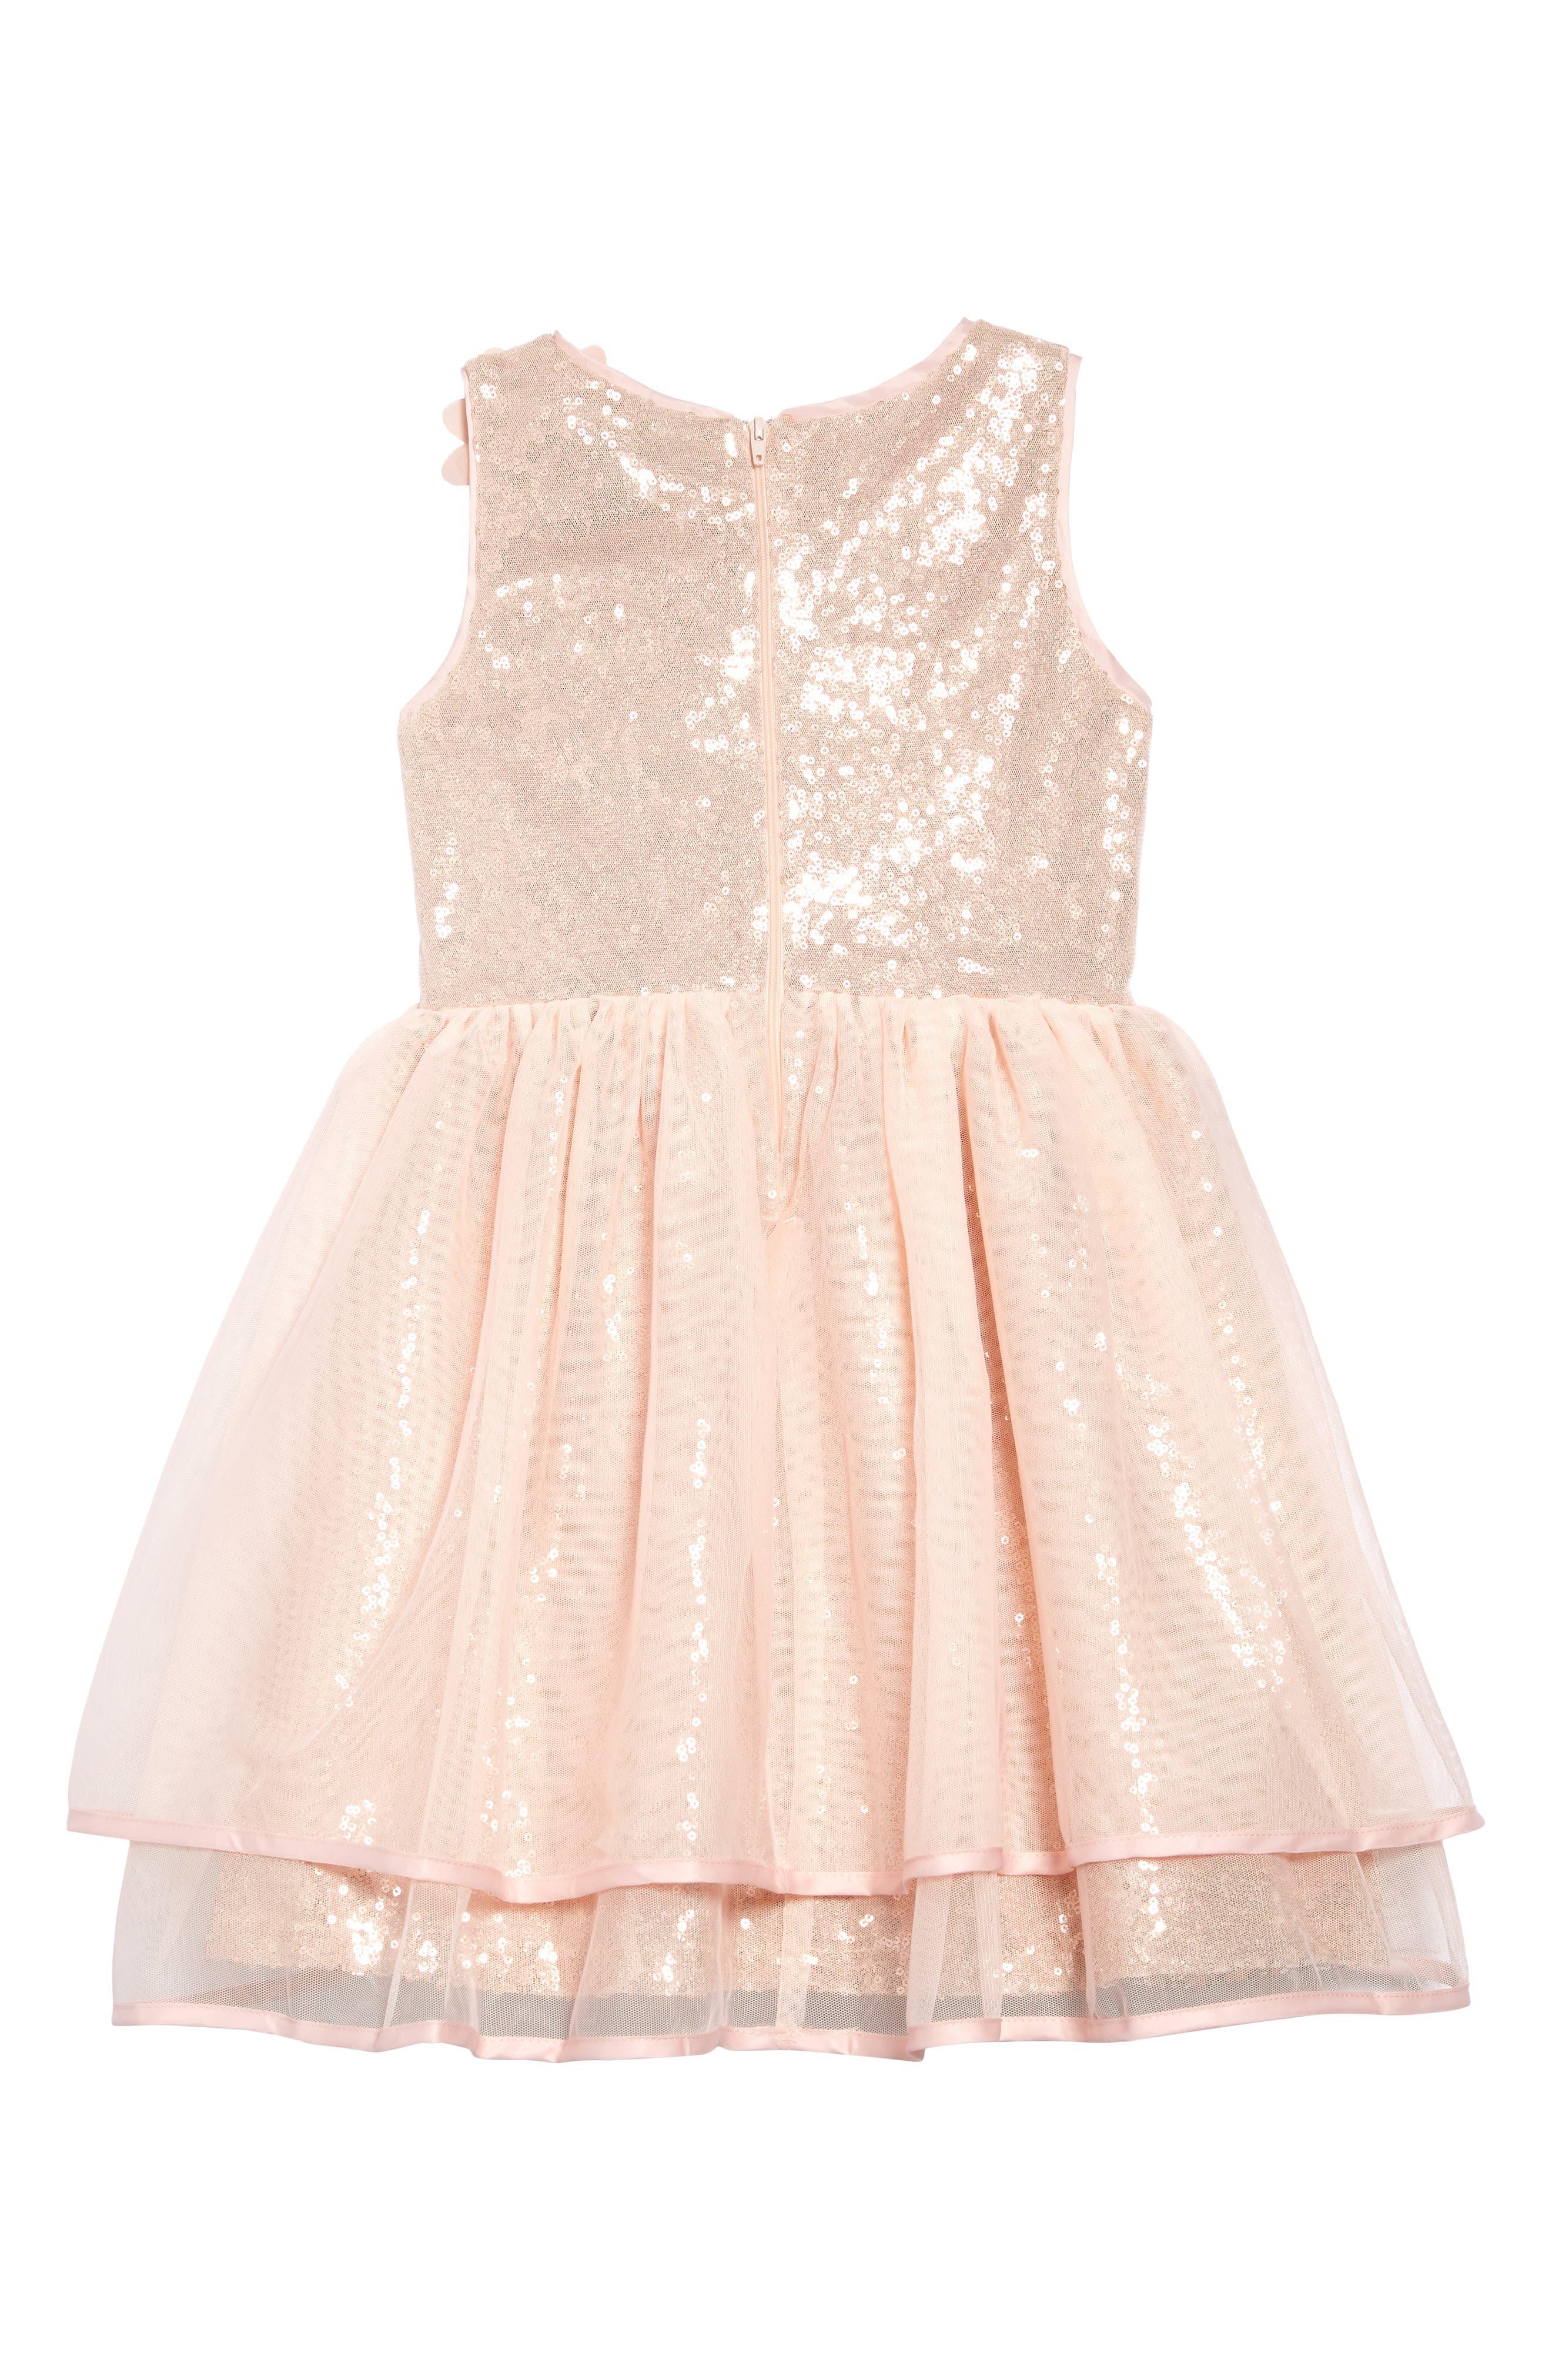 AVA & YELLY,                             Floral Appliqué Sequin Dress,                             Alternate thumbnail 2, color,                             BLUSH